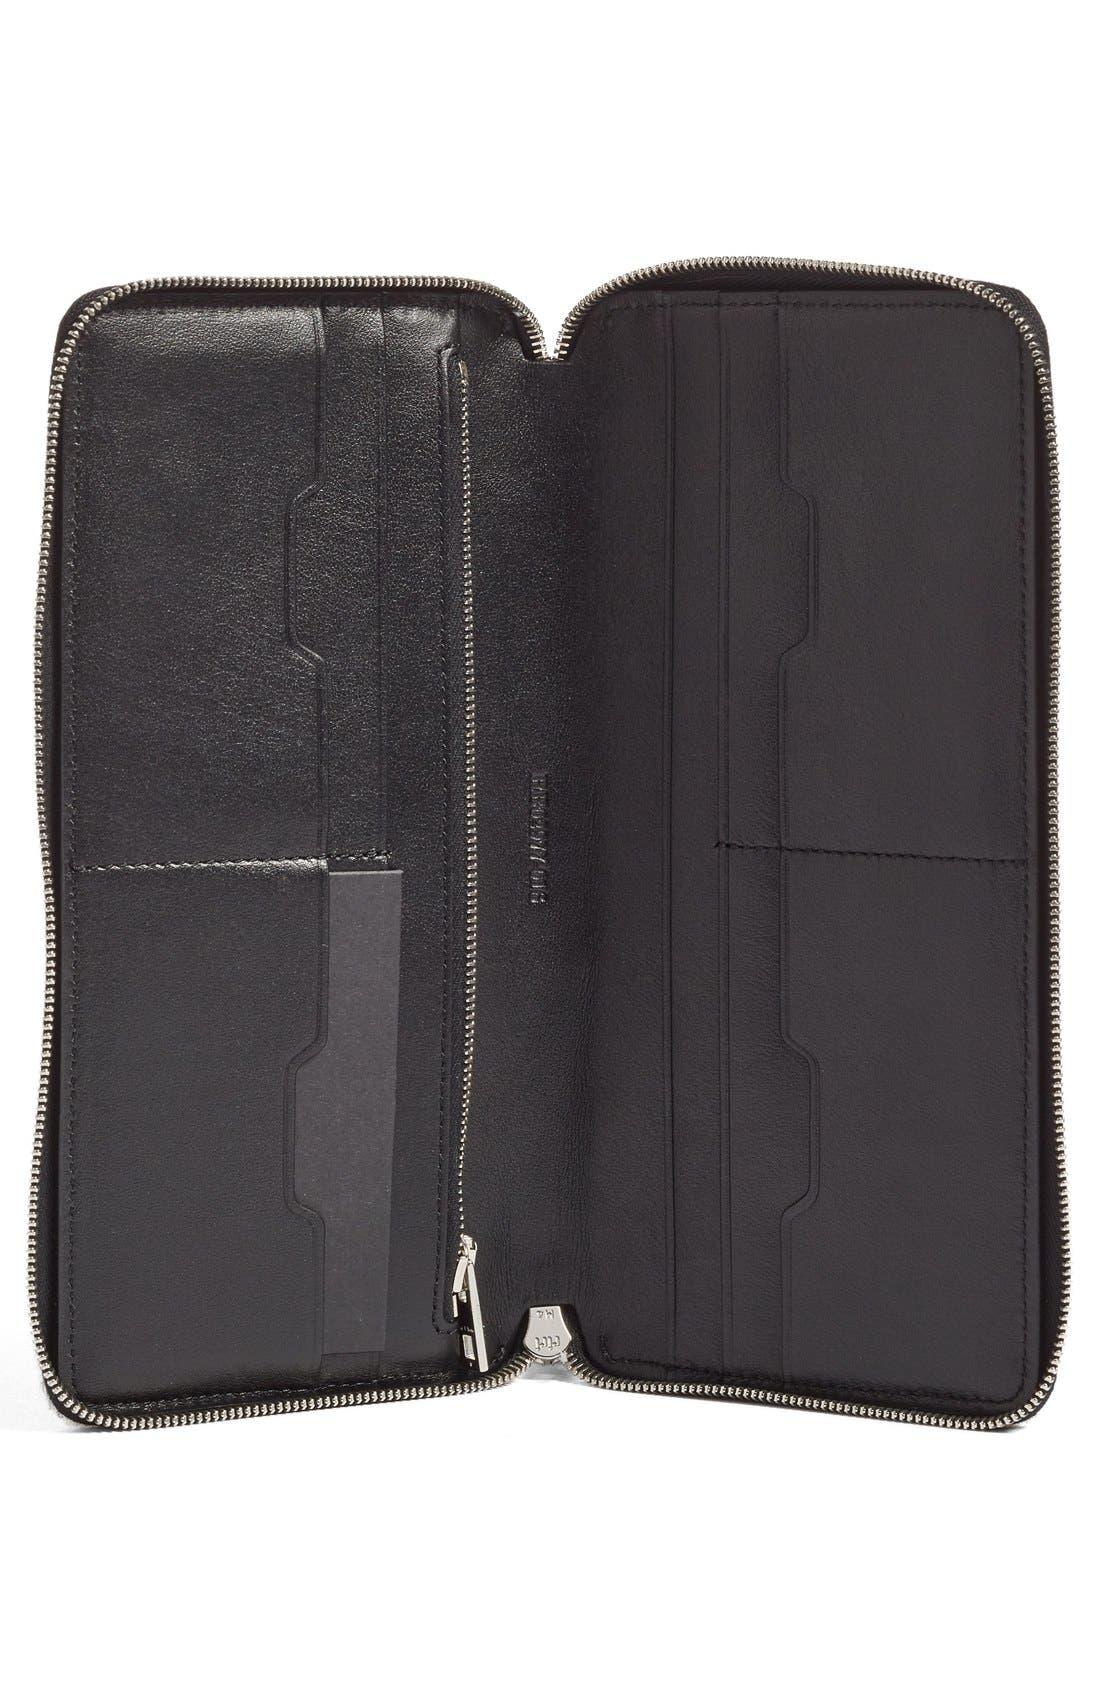 Leather Zip Around Wallet,                             Alternate thumbnail 2, color,                             Black